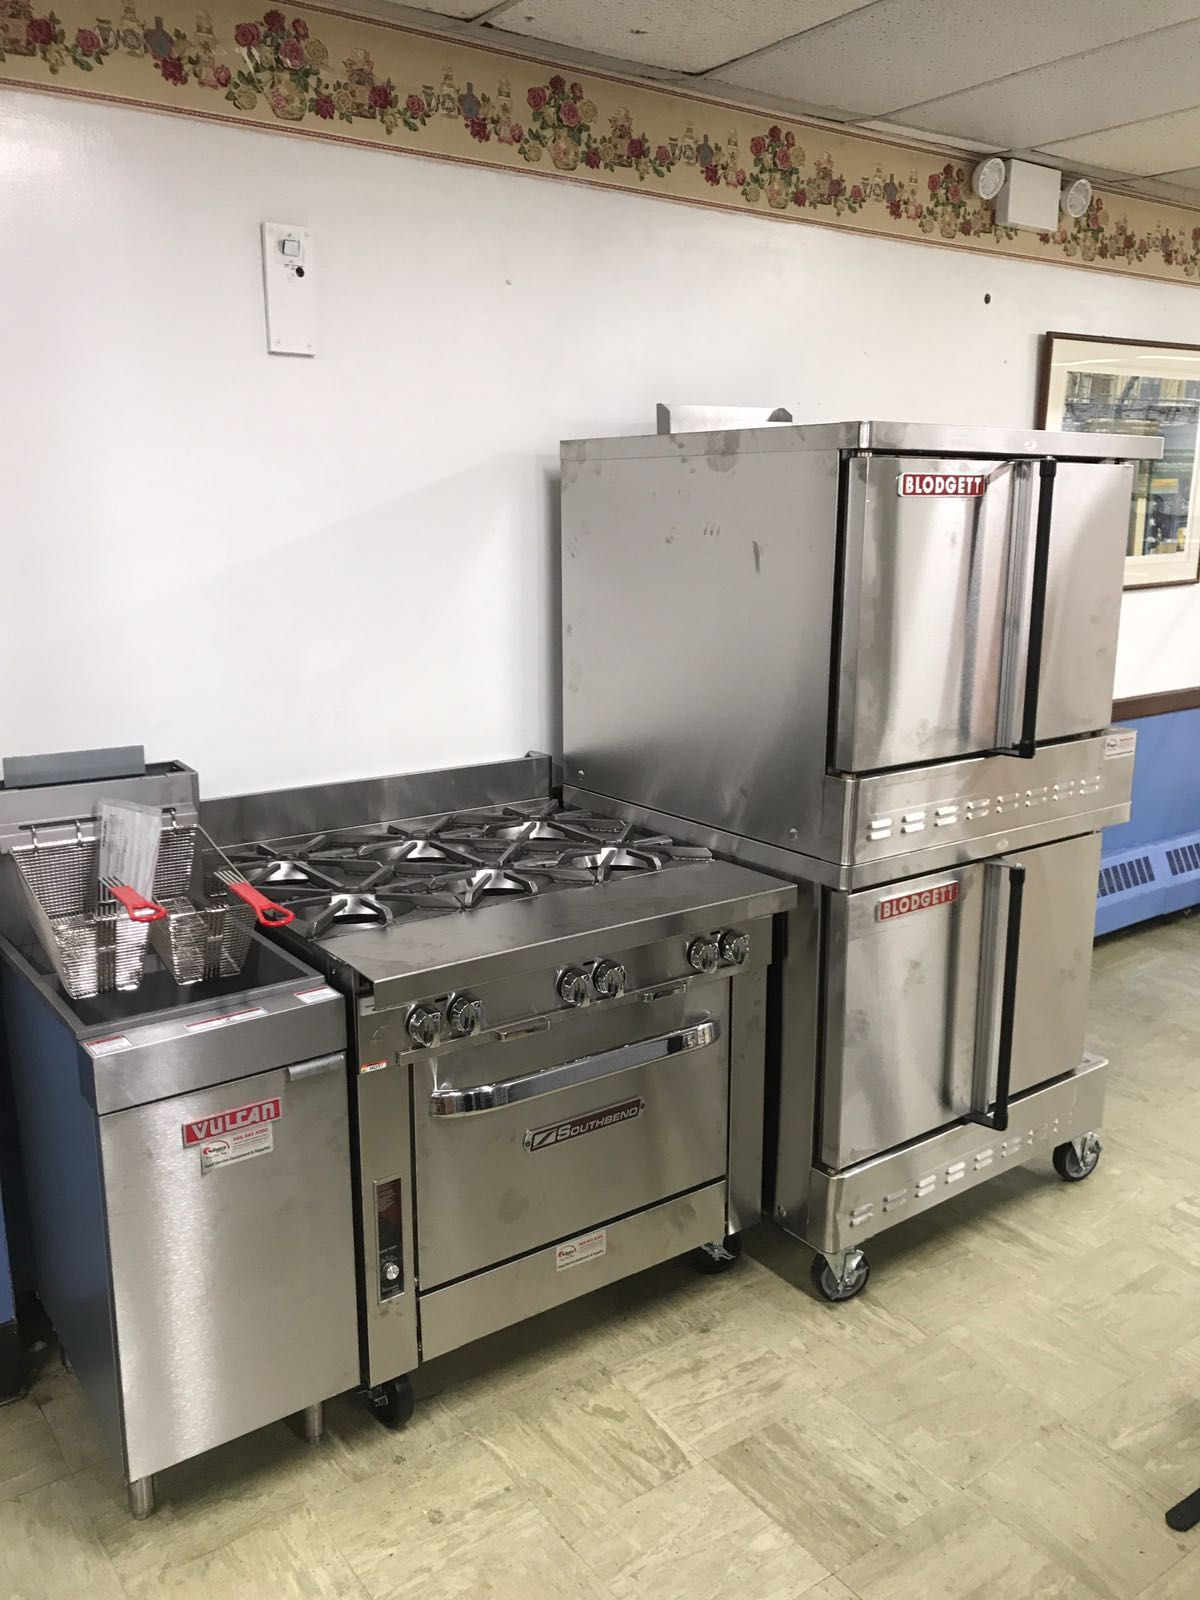 Vulcan Kitchen Hamptons Design Fryer Southbend Range And Blodgett Convection Oven Culinarydepot